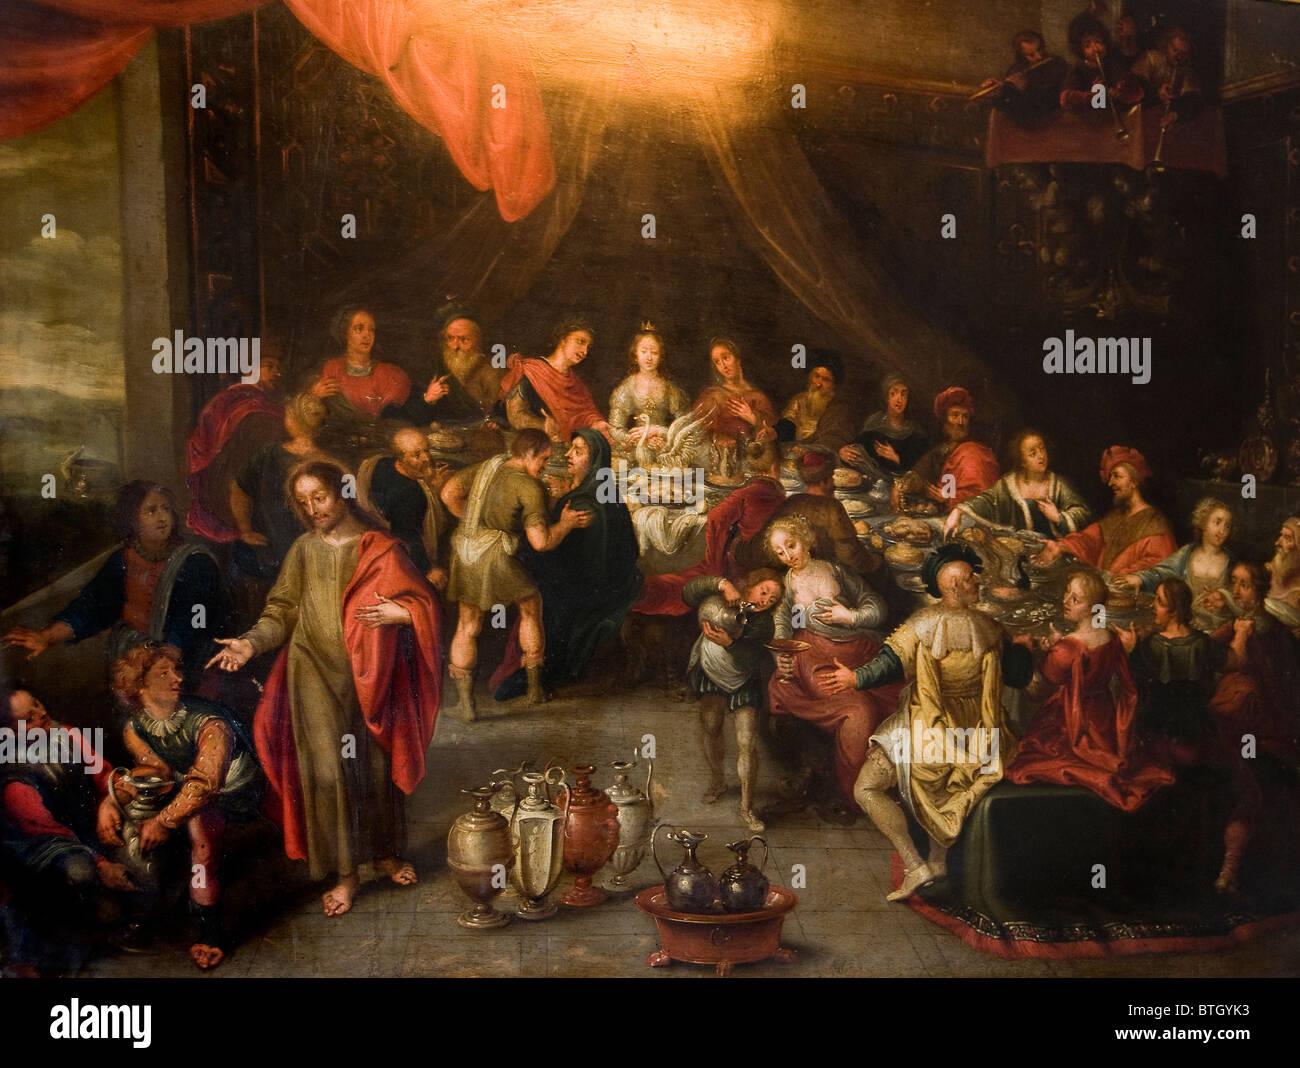 Cordoba Spain The Wedding of Cana Jesus Christ 16 Century Spanish Painting - Stock Image